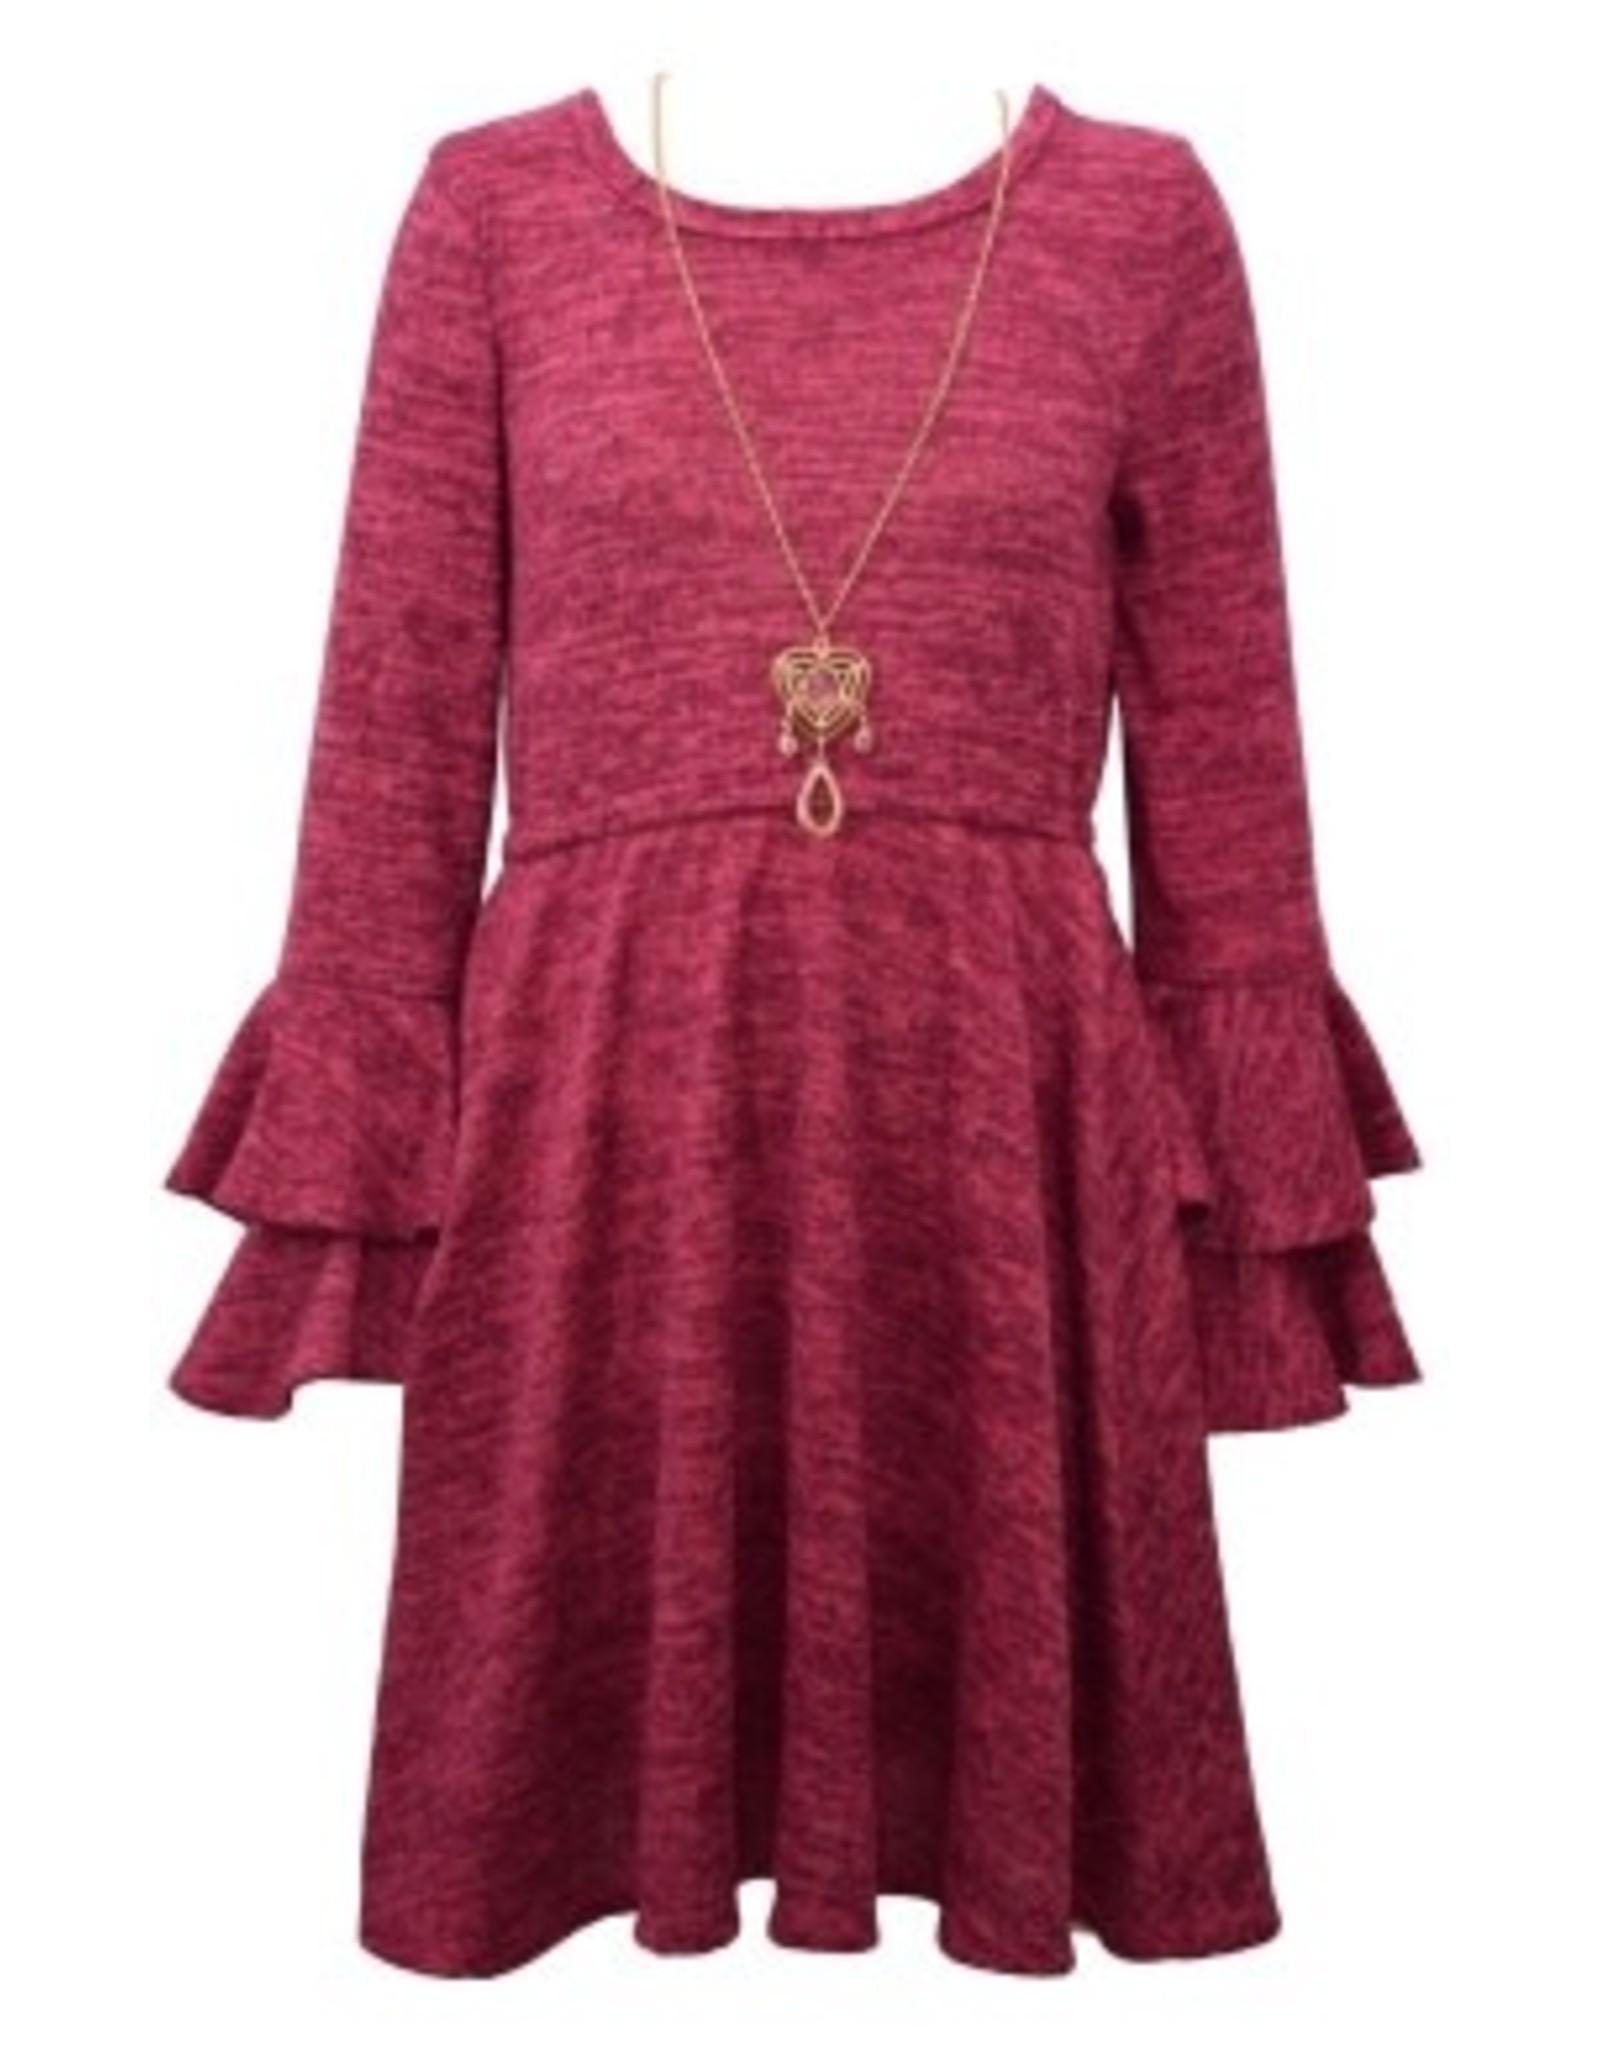 Bonnie  Jean Bonnie Jean- Double Bell Knit Fuschia Dress